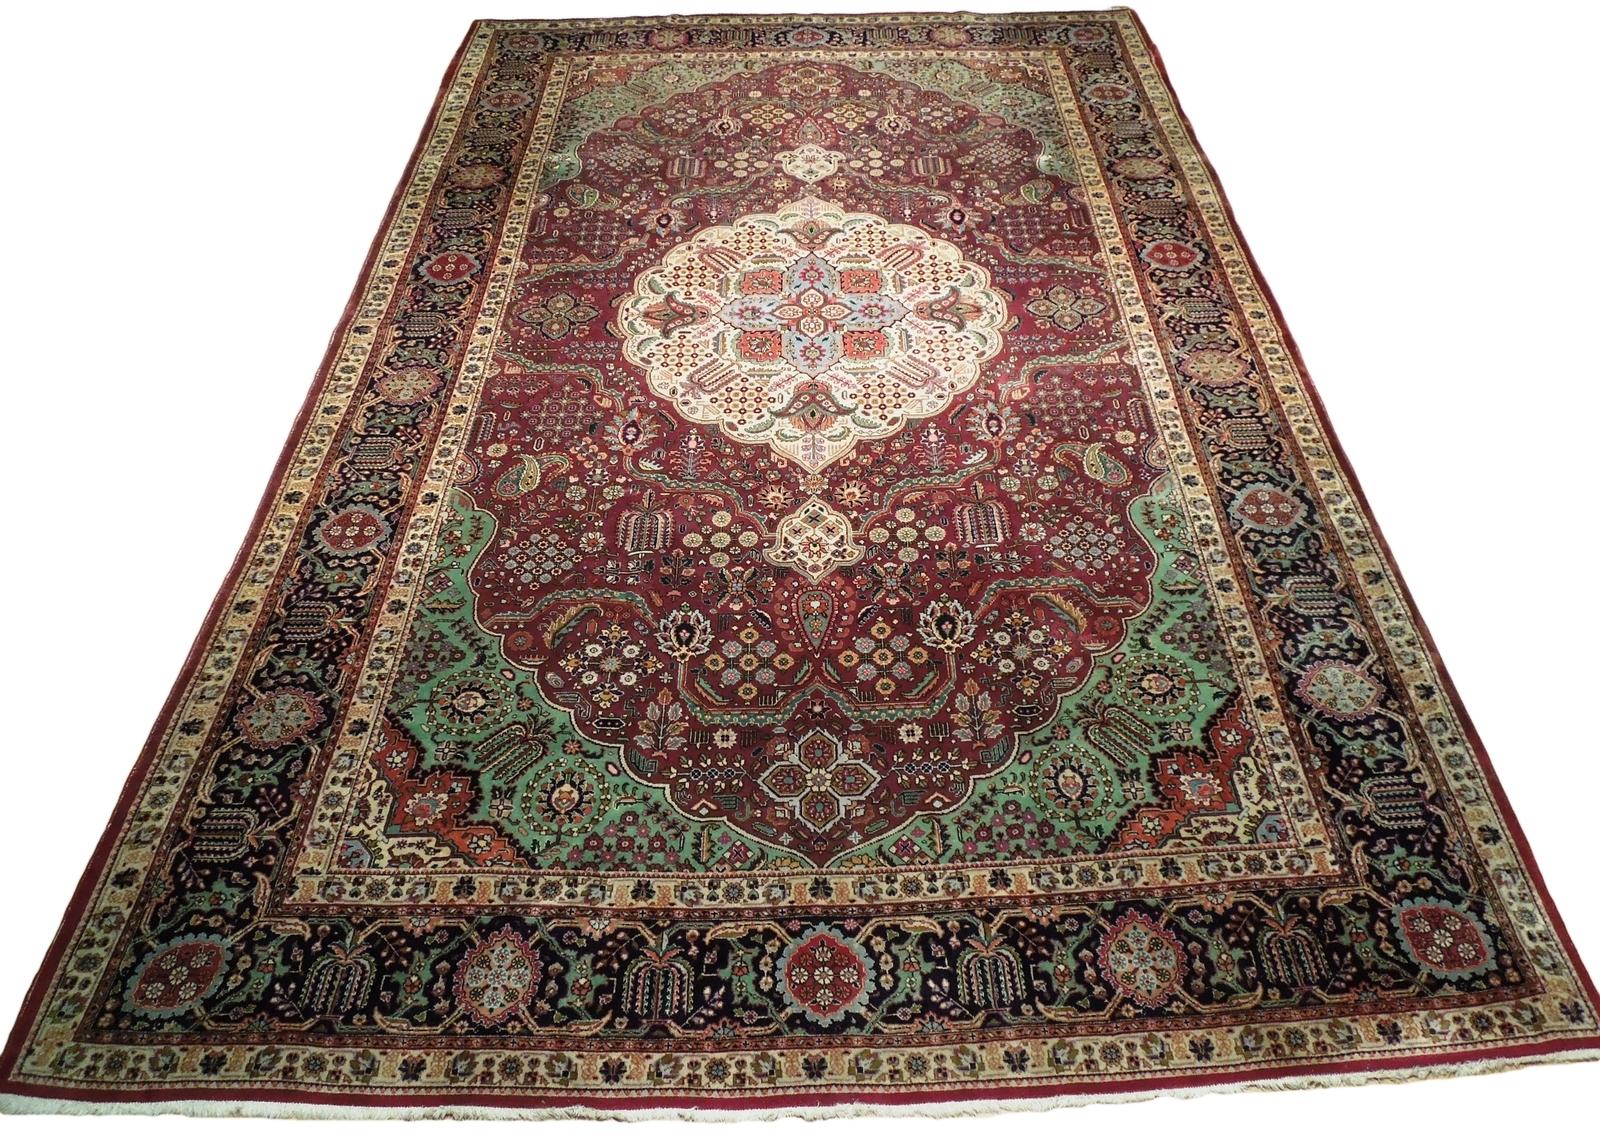 Compex Design Original Red Traditional Persian Wool Handmade Rug 10x16 Rug